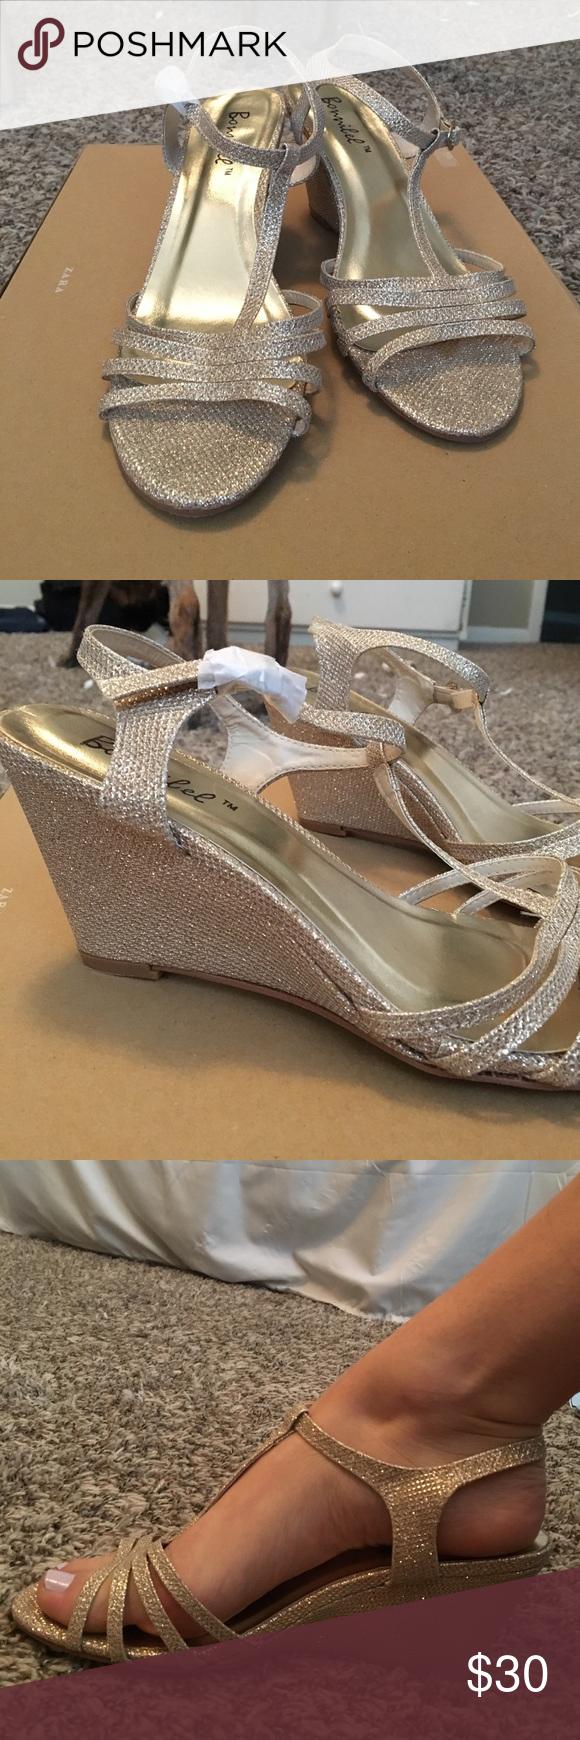 CHAMPAGNE BONNIBEL 8.5 GLITTER SANDAL HEELS Perfect condition, never worn heels. bonnibel Shoes Heels